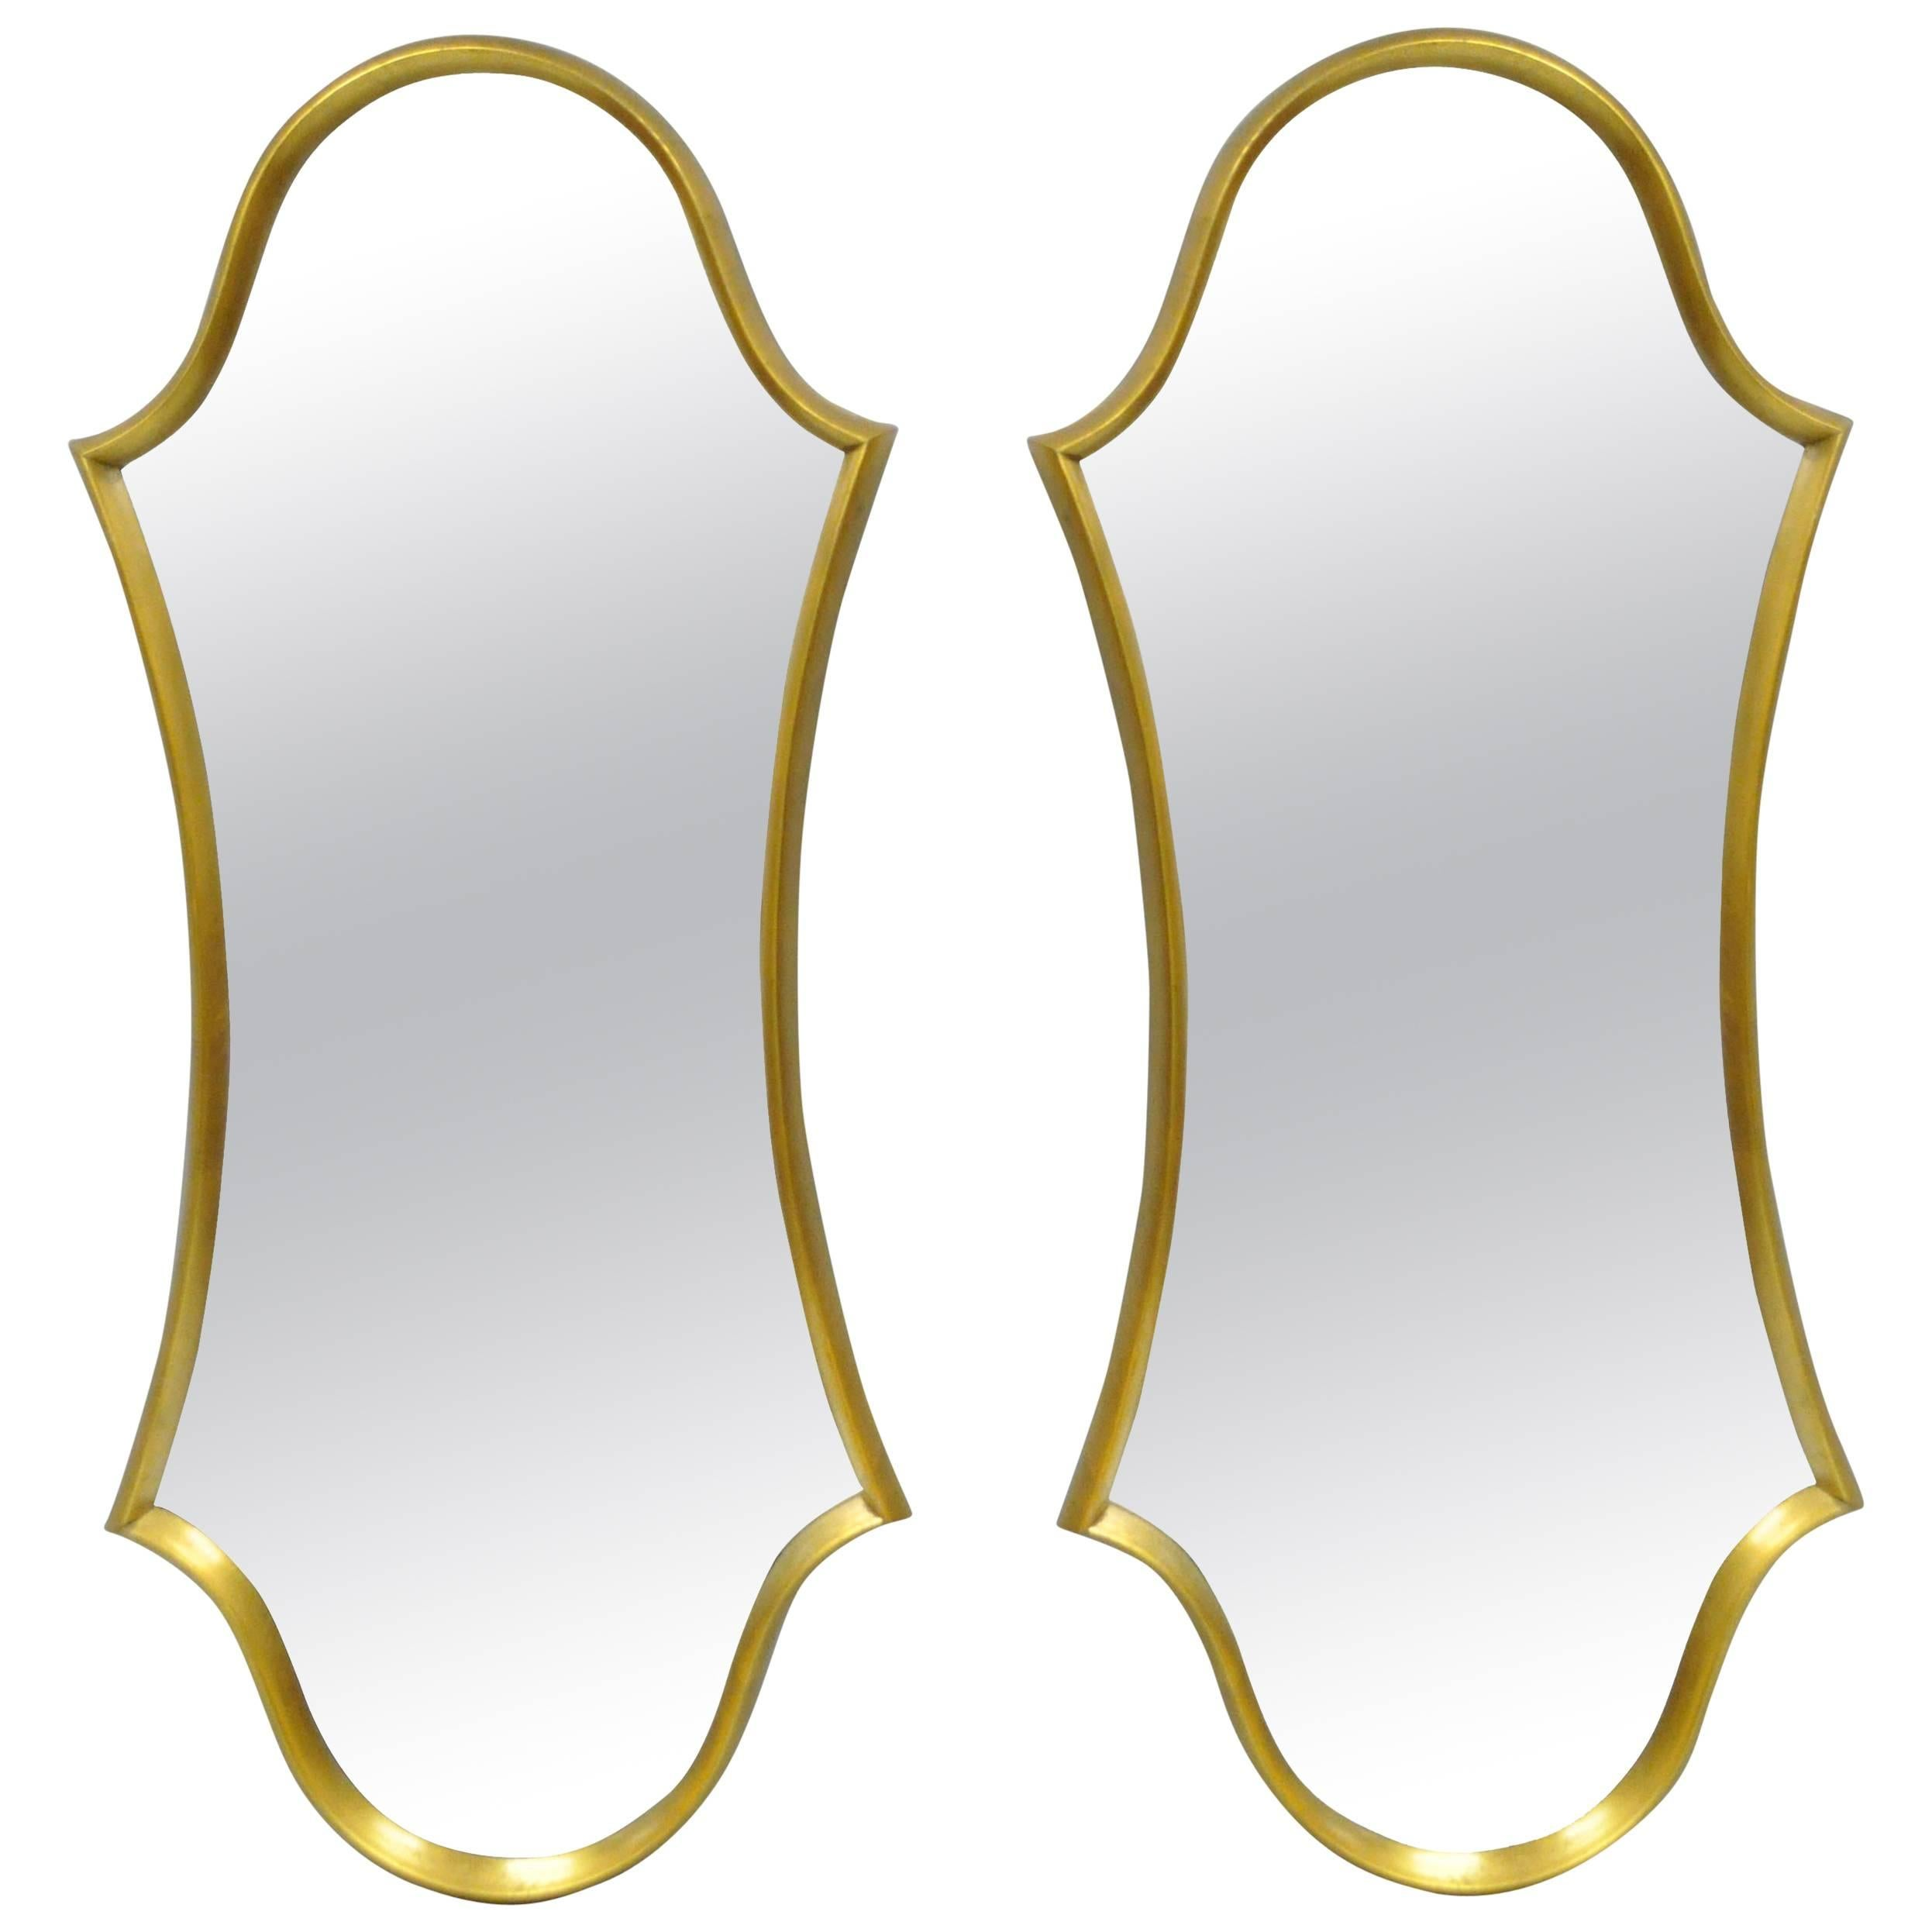 Pair of Hollywood Regency Wood Frame Gold Leaf Keyhole Wall Mirrors Attr Labarge